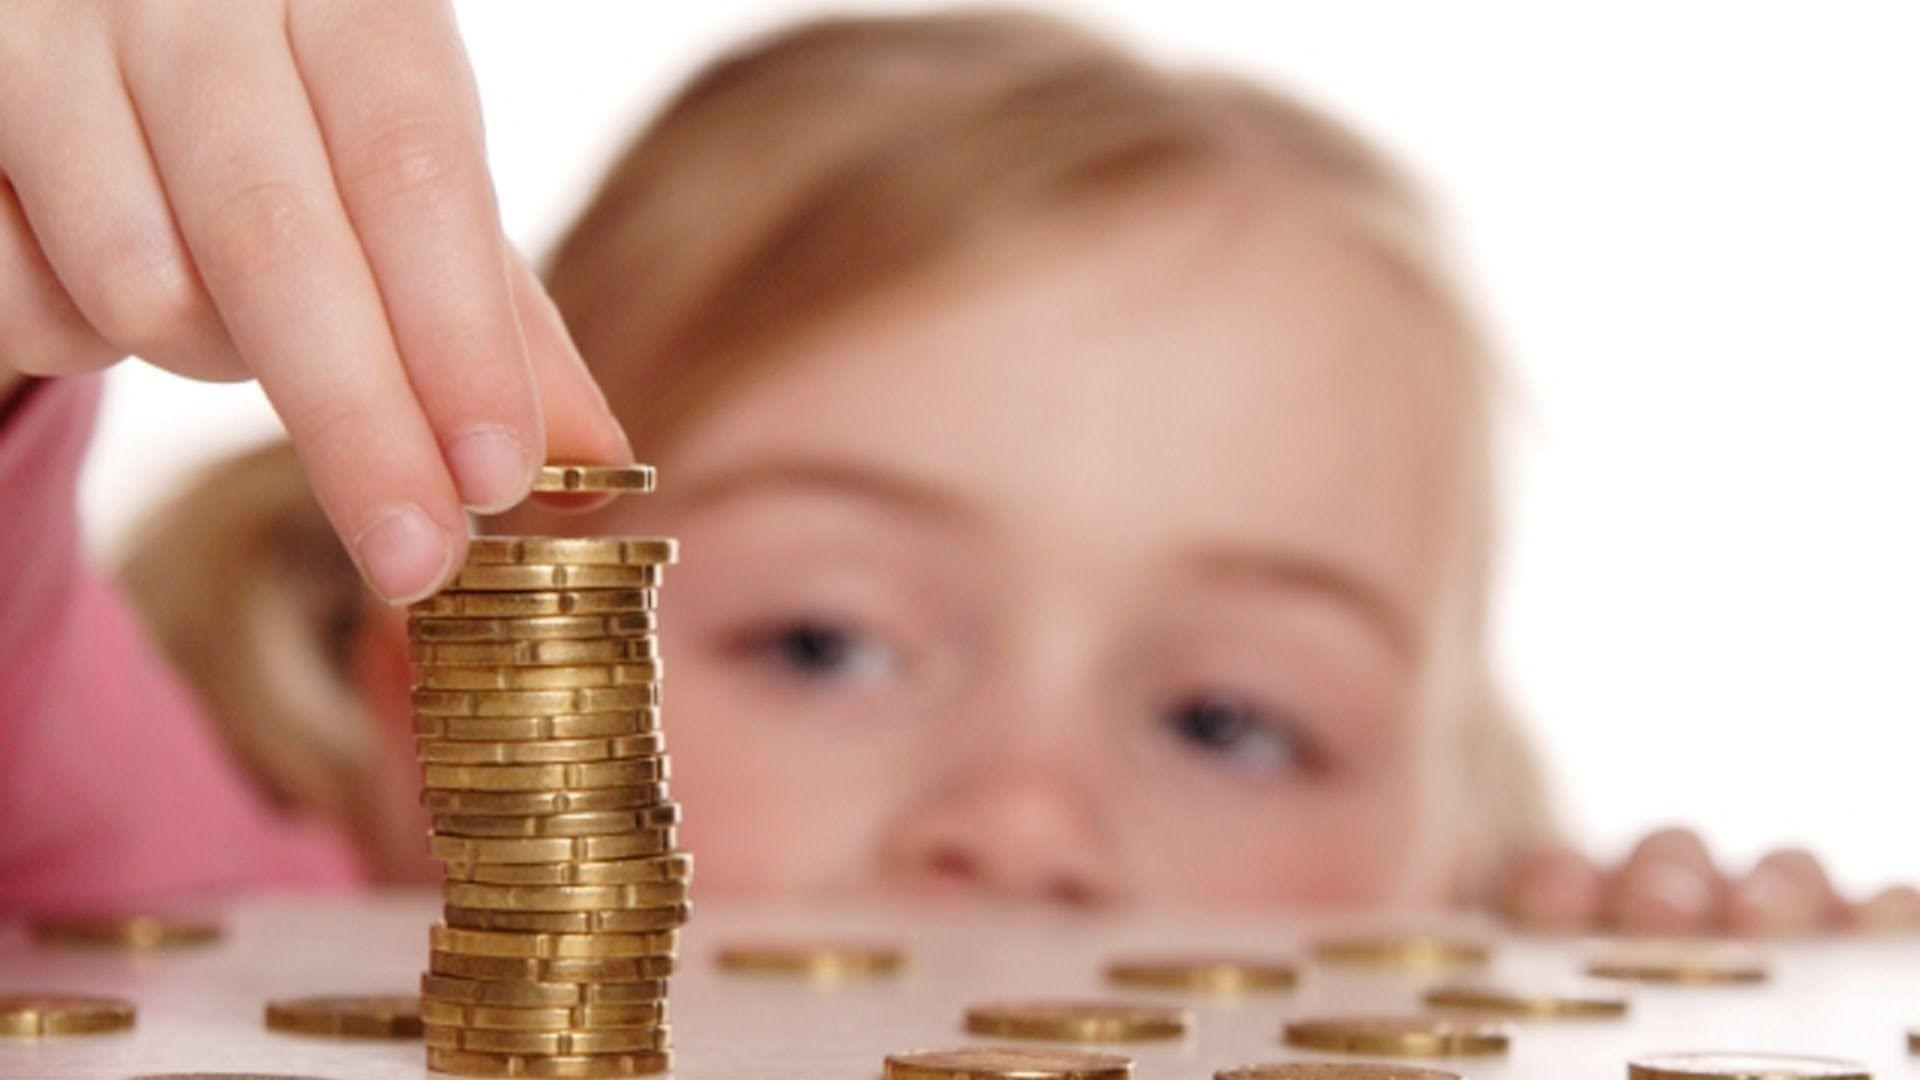 ребенок строит пирамиду из монет